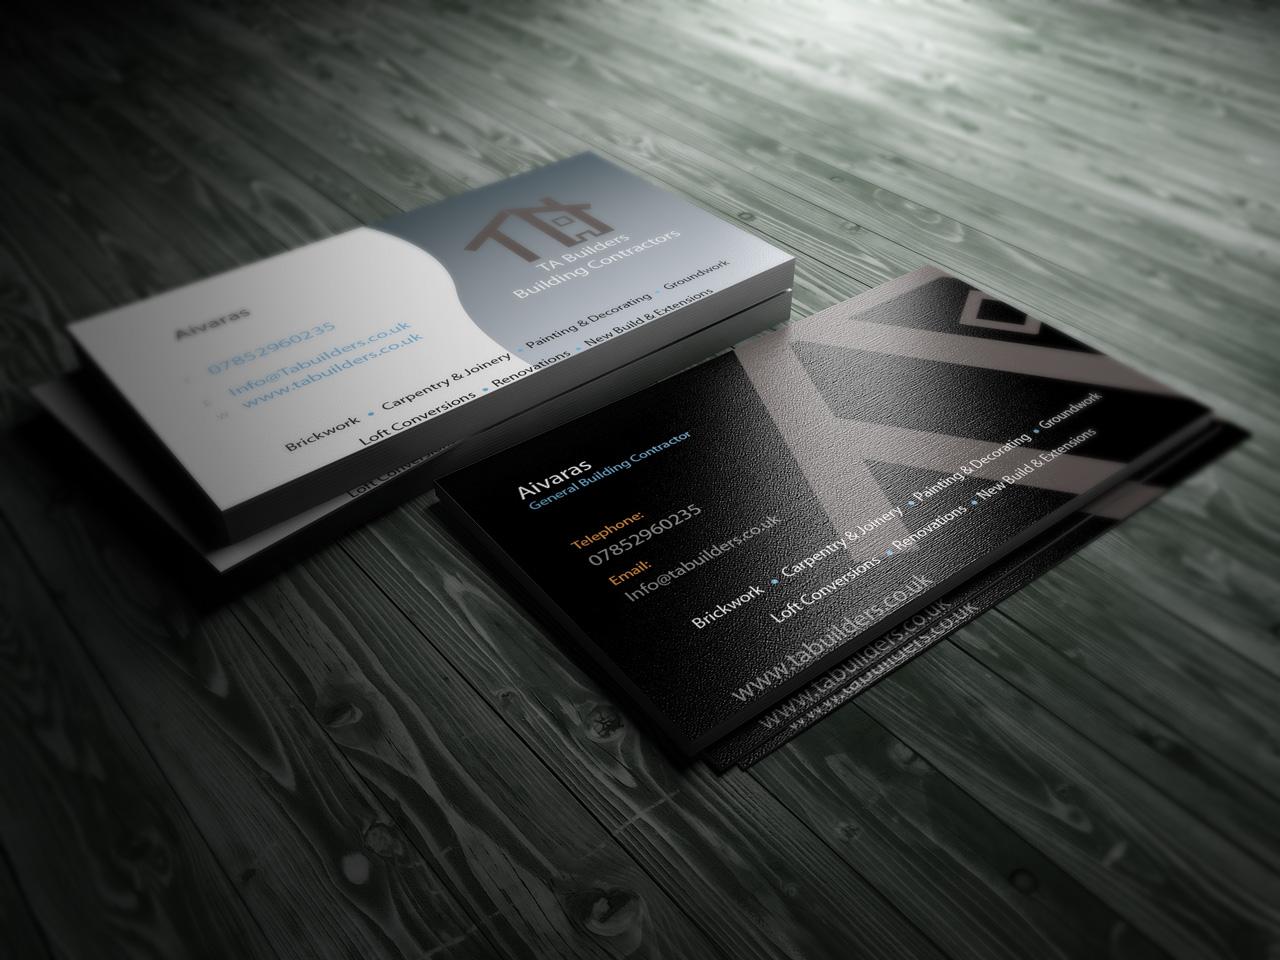 Business card ta builders dzwebs it solutions business card ta builders colourmoves